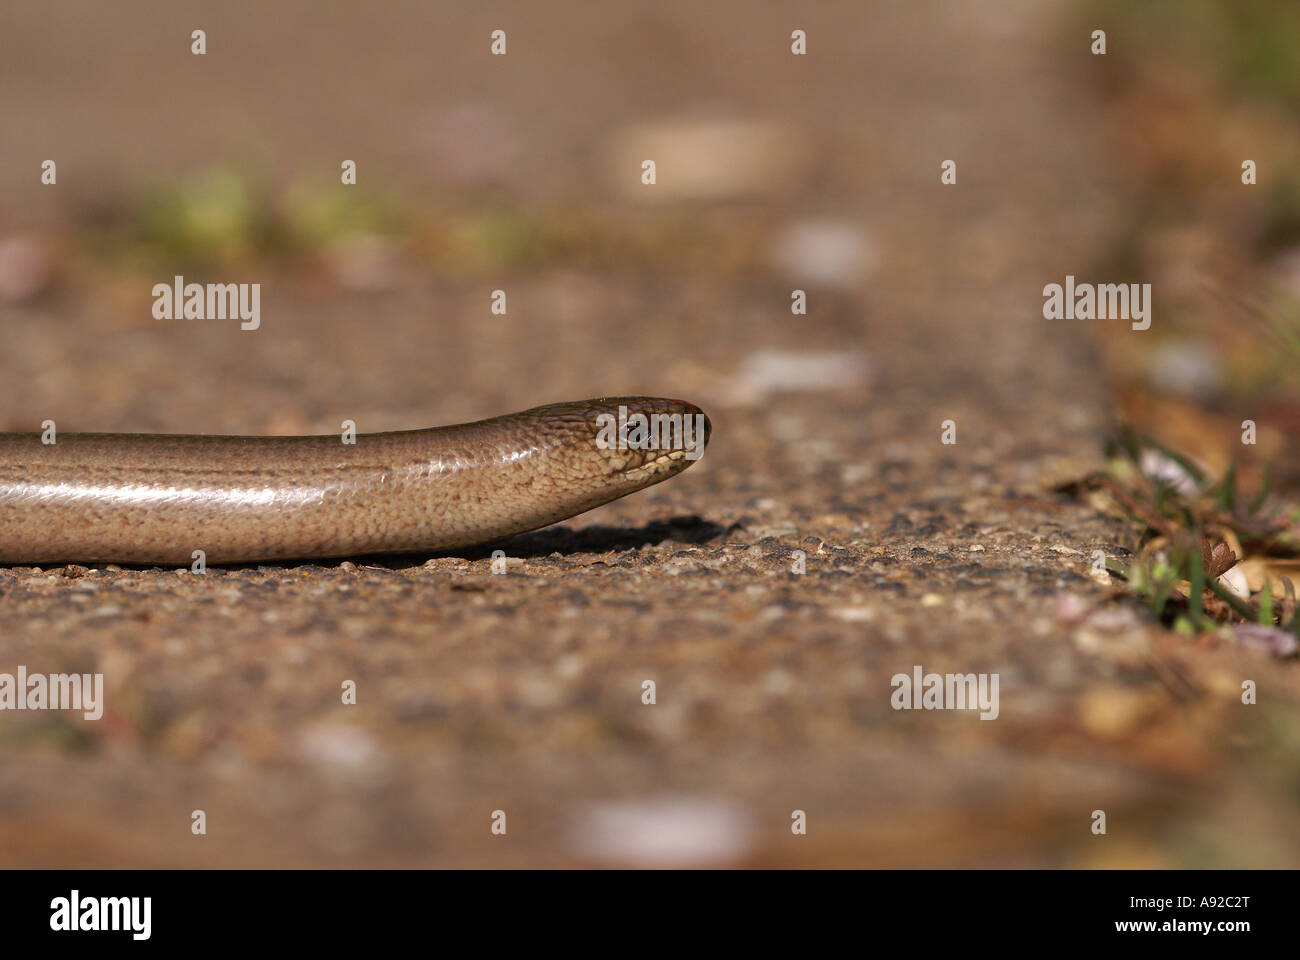 Blindworm (Anguis fragilis) Stock Photo